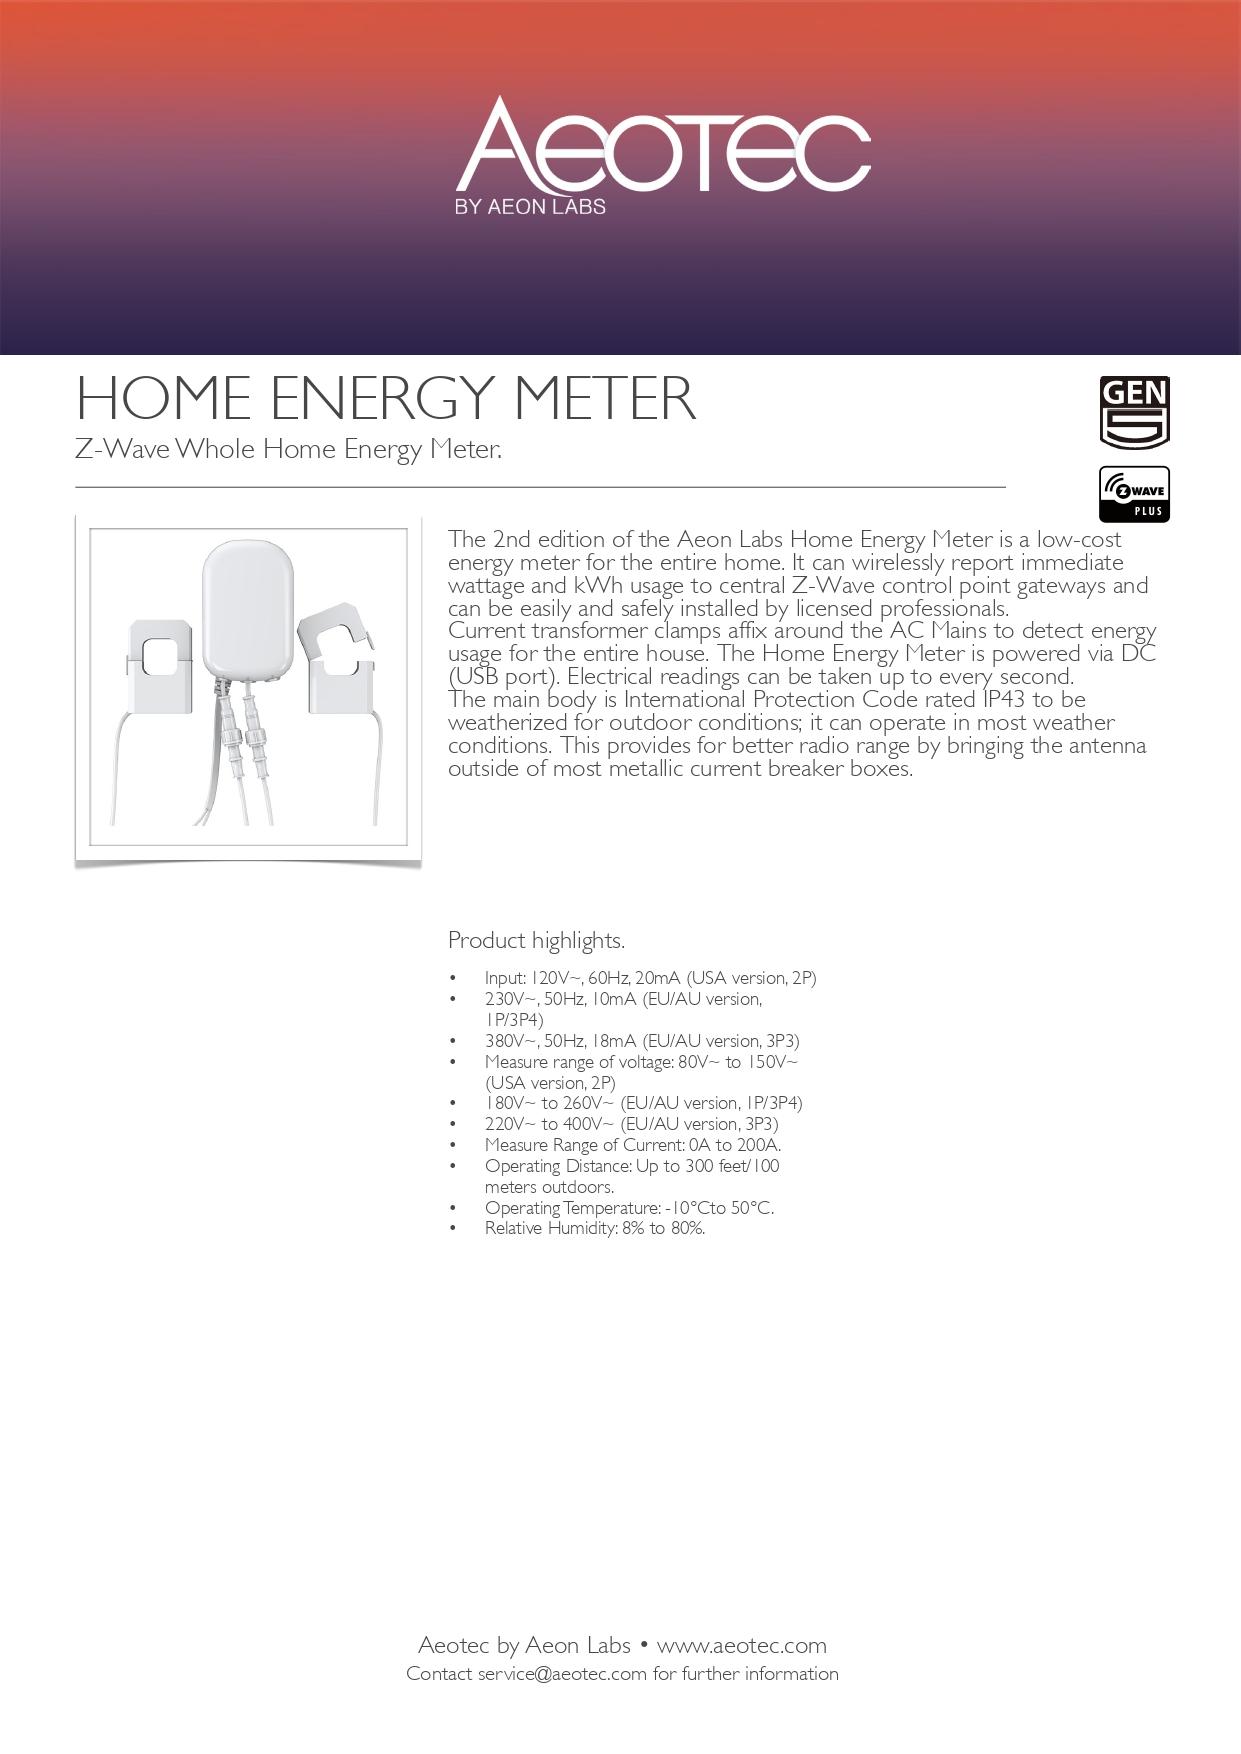 Aeotec Home Energy Meter 3-Clamp (60A) Gen5